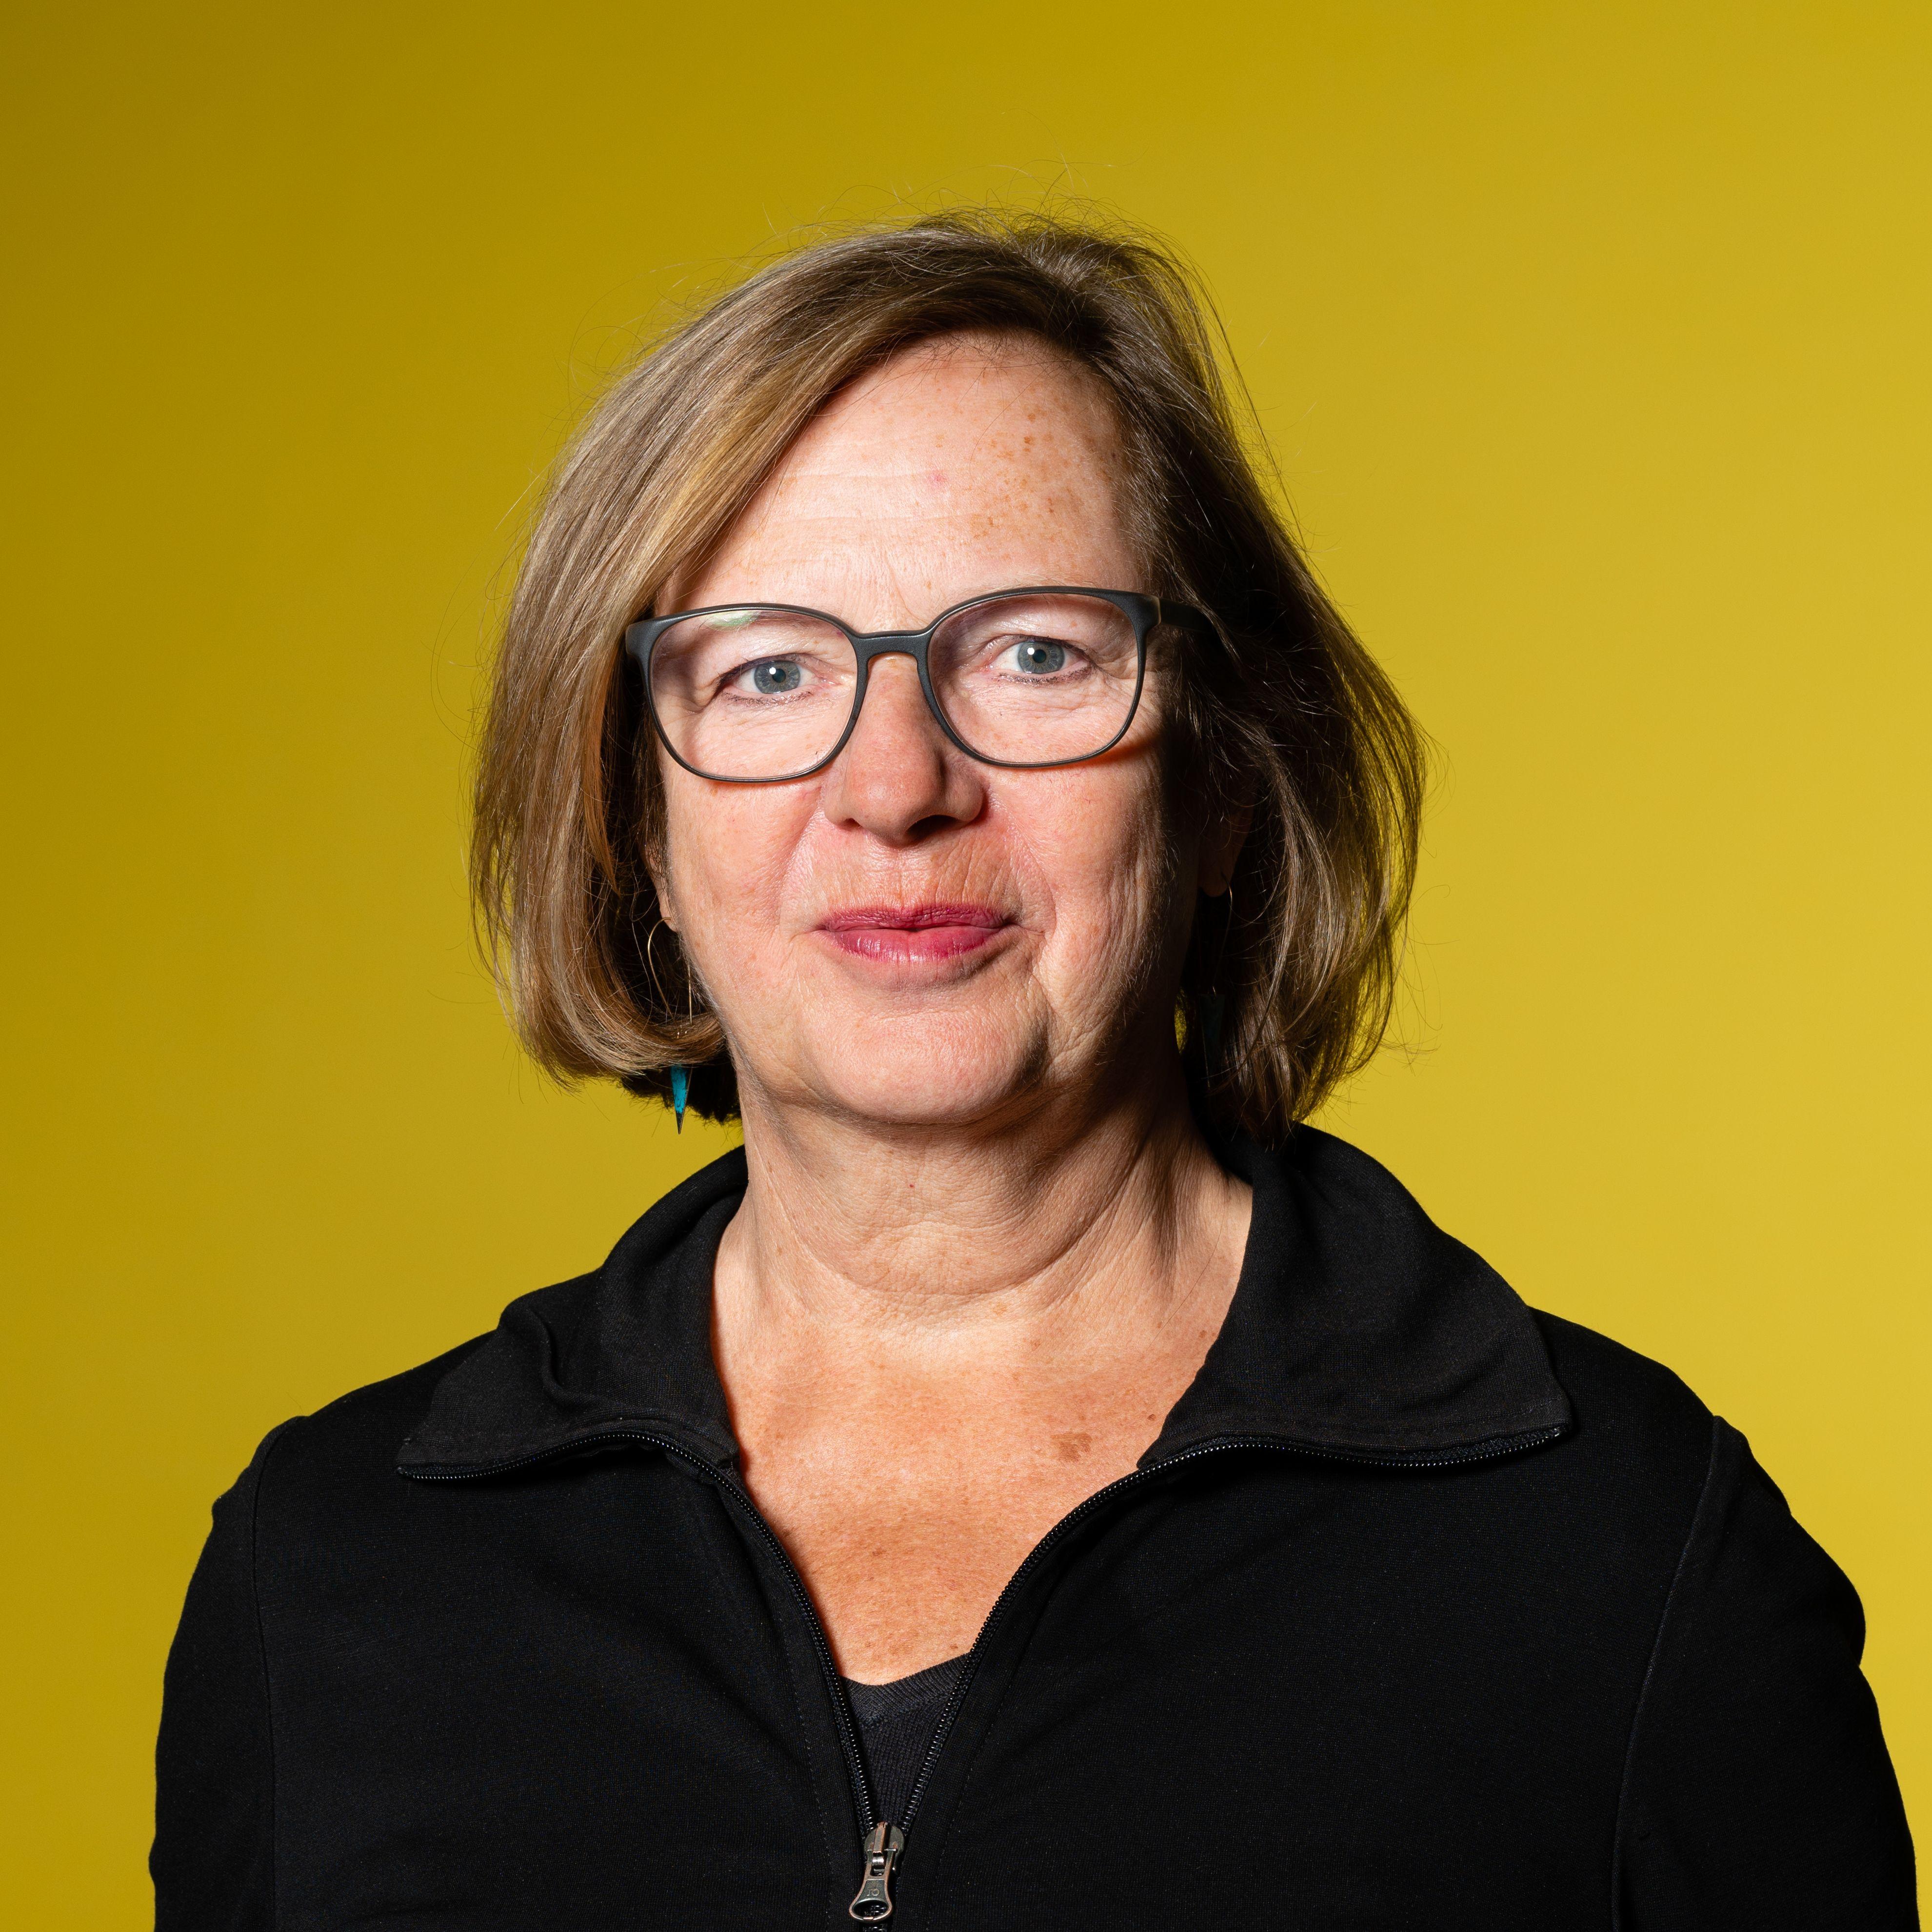 Dorothea Reinicke